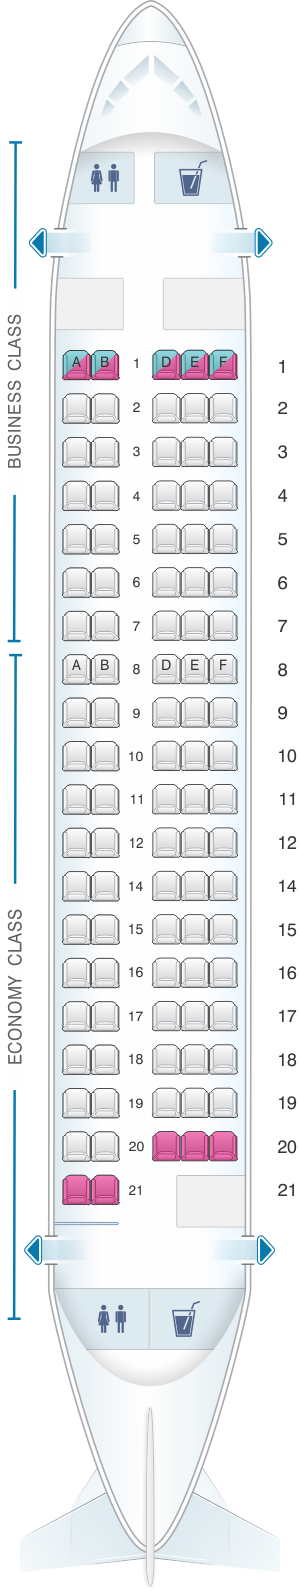 Seat map for SWISS Avro RJ100